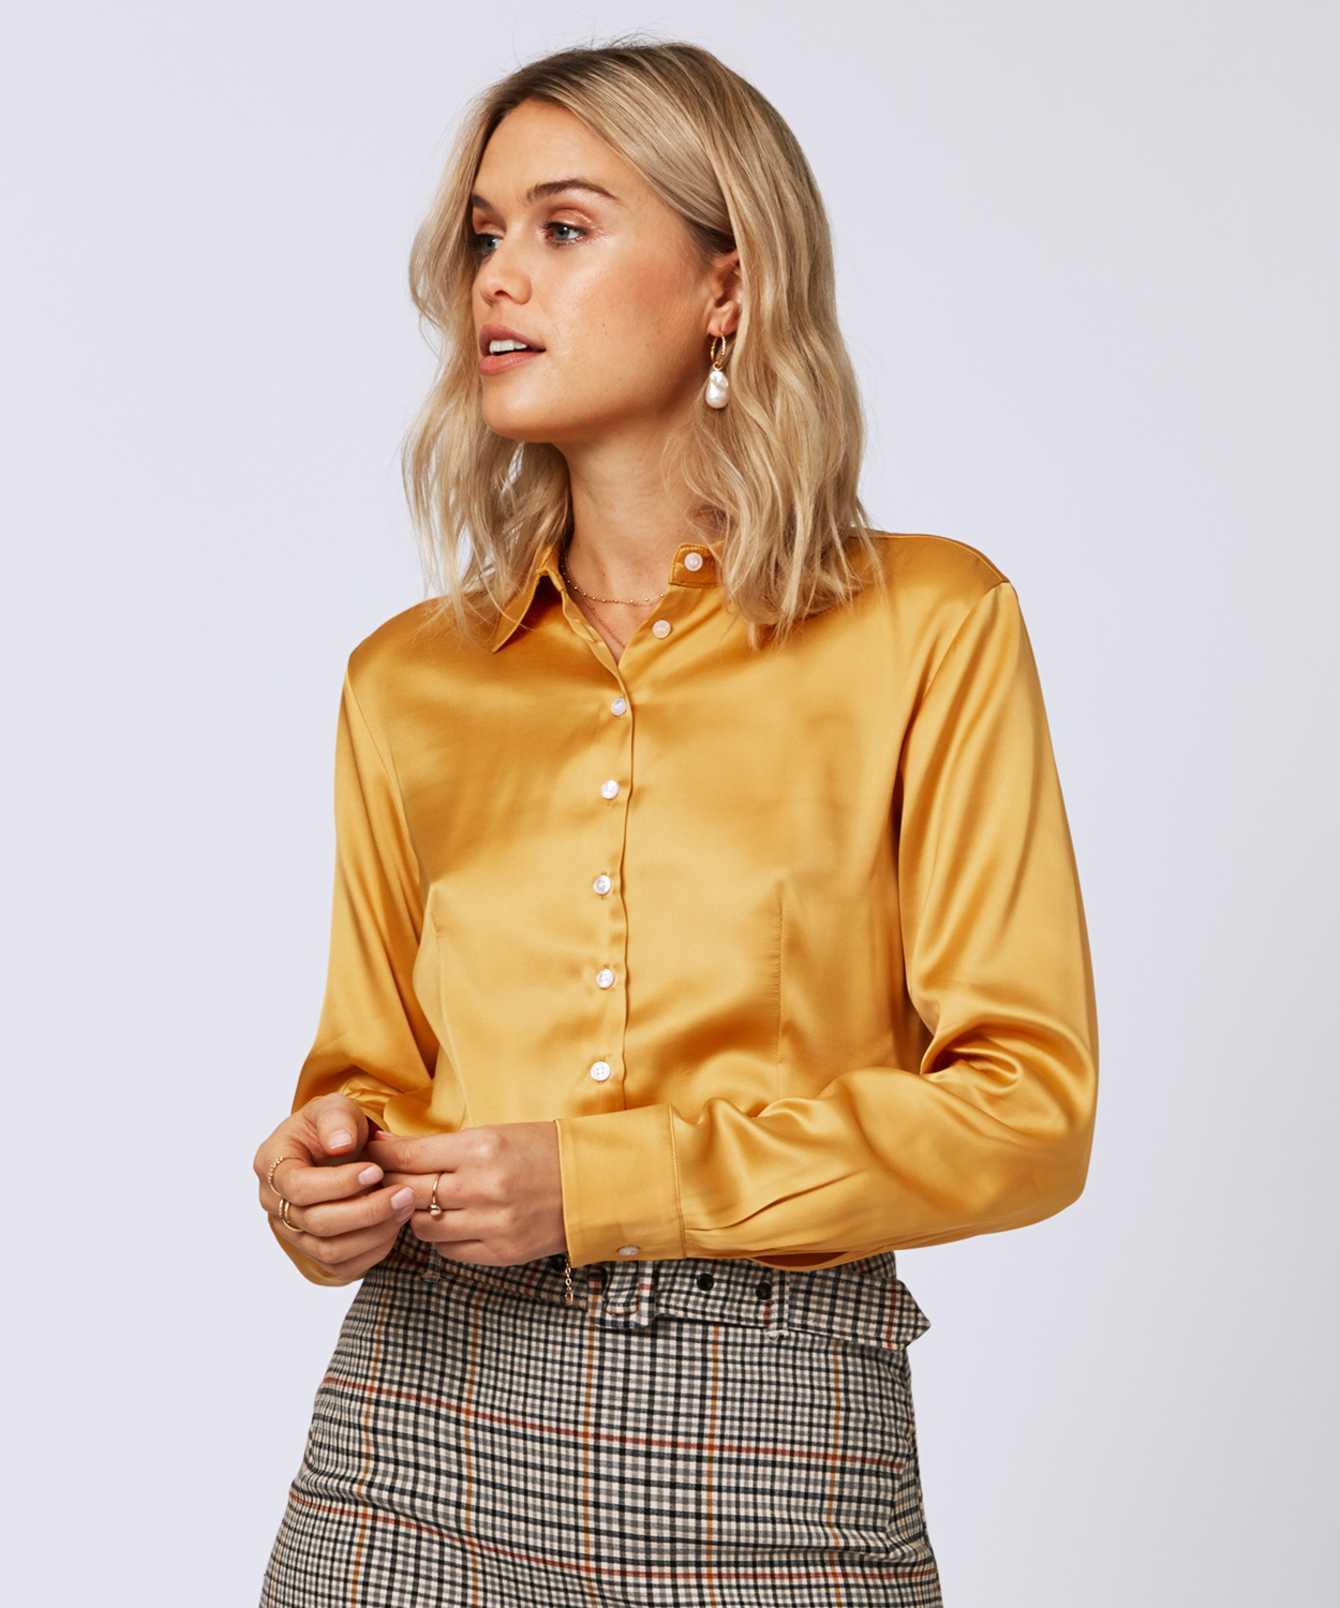 Skjorta Tilde Sublime Guld  The Shirt Factory